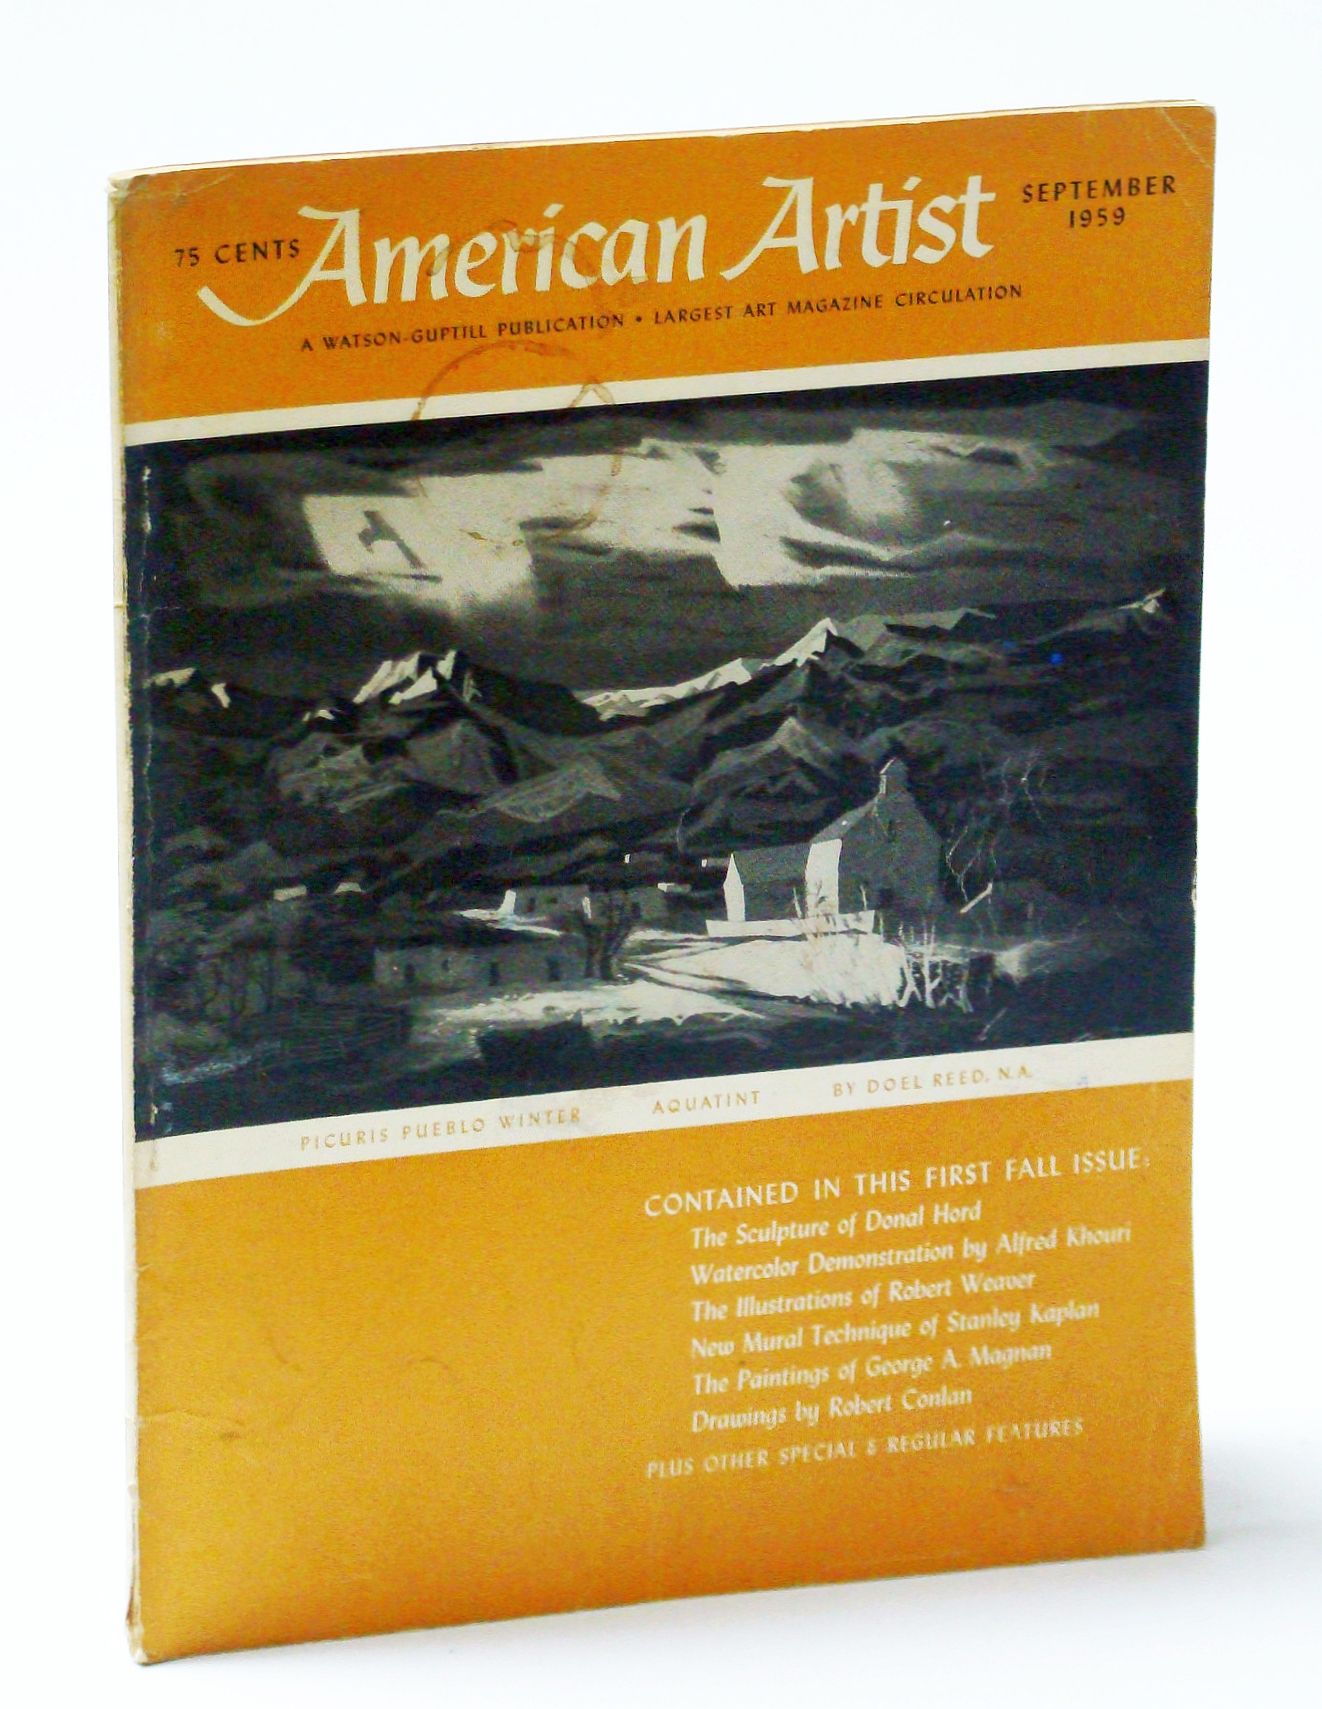 Image for American Artist Magazine, September (Sept.) 1959 - George A. Magnan / Realism of Robert Weaver